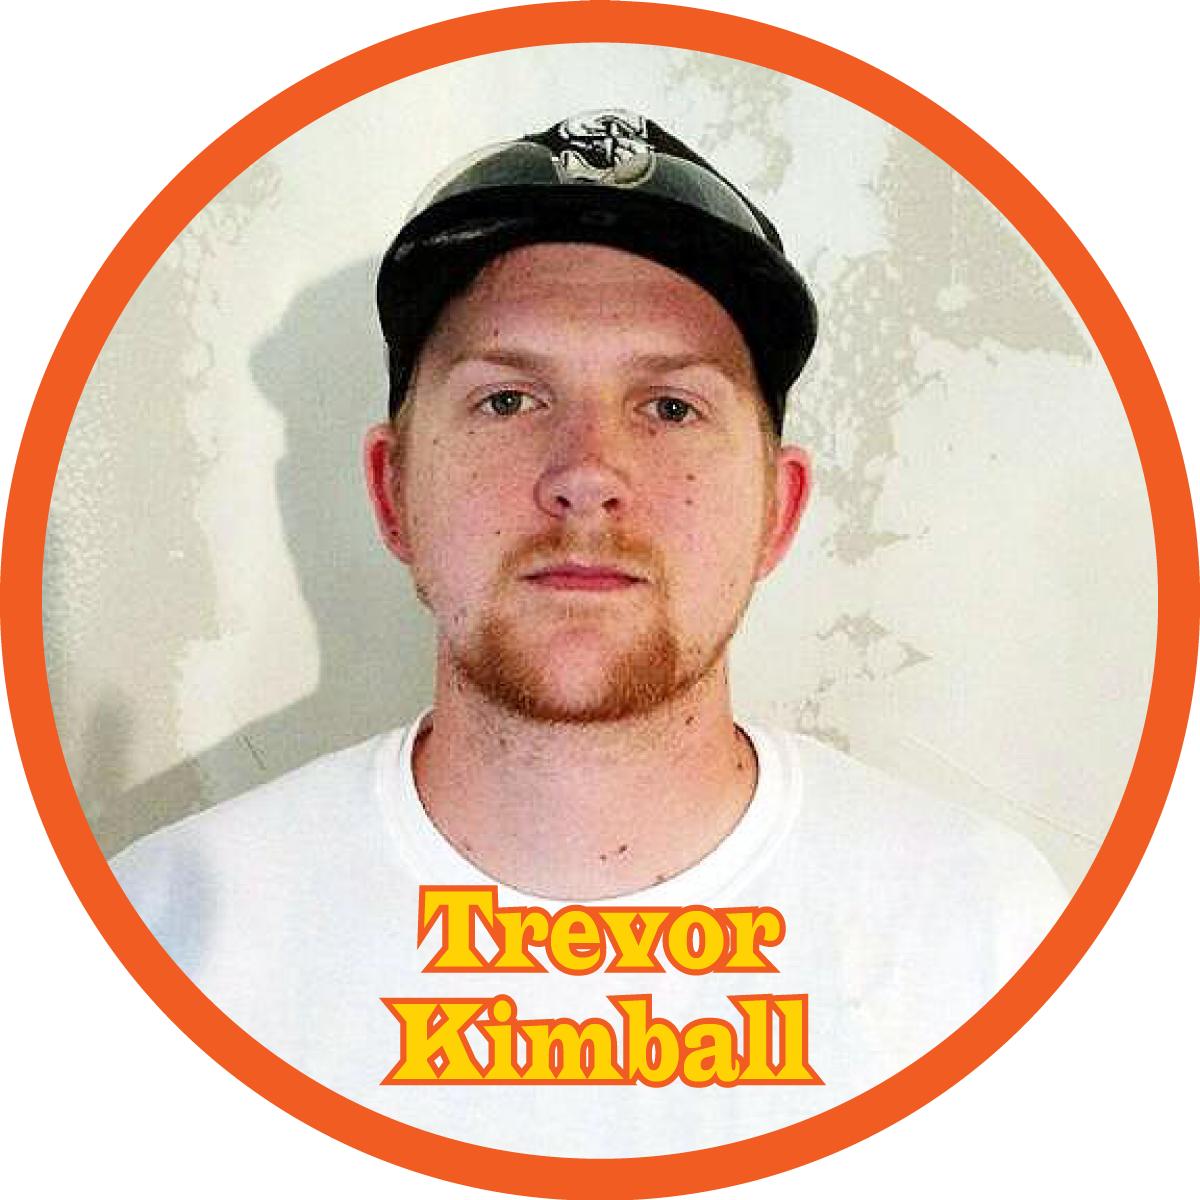 Pookies_website-headshots-Trevor-Kimball_v1.png